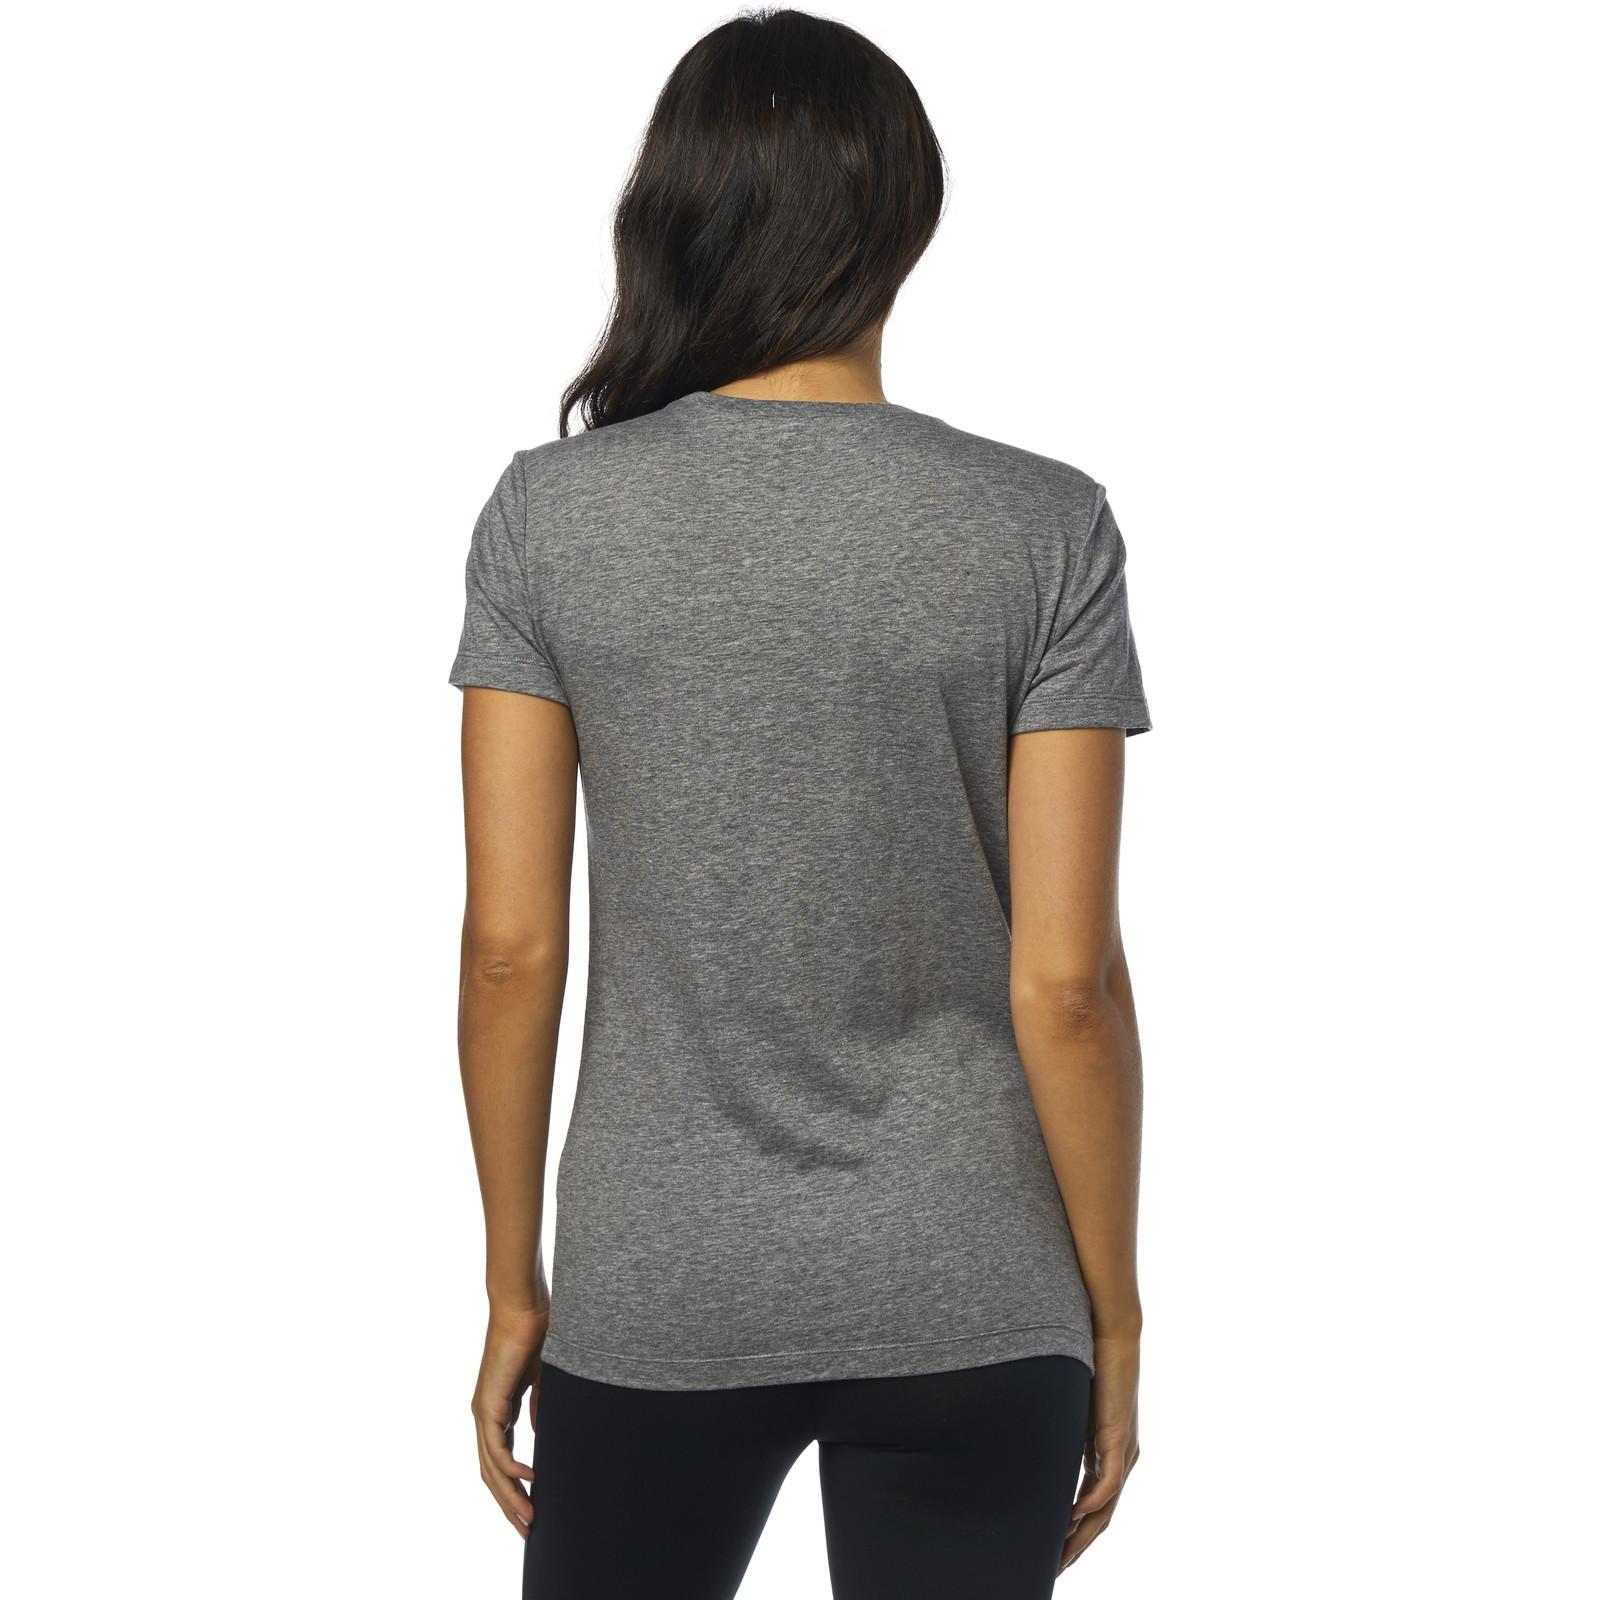 Fox Racing Retro Fox Ladies Short Sleeve Crew Neck T-Shirt Casual Wear Womens